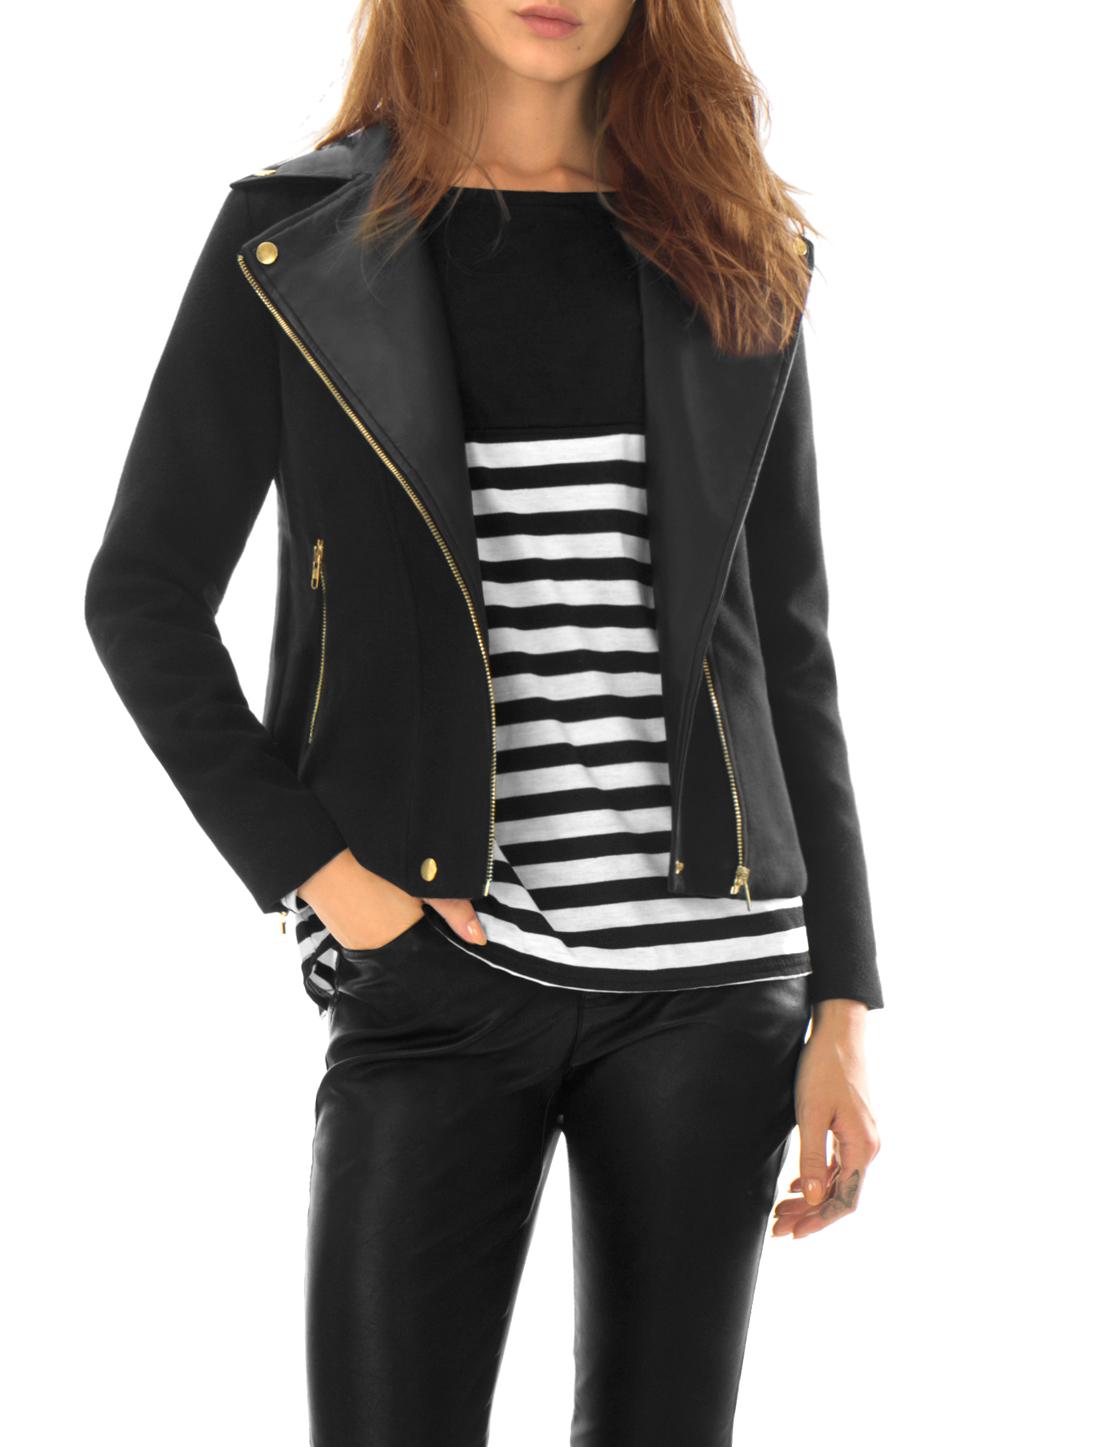 Women Asymmetrical Zipper Front PU Panel Worsted Jacket Black XS